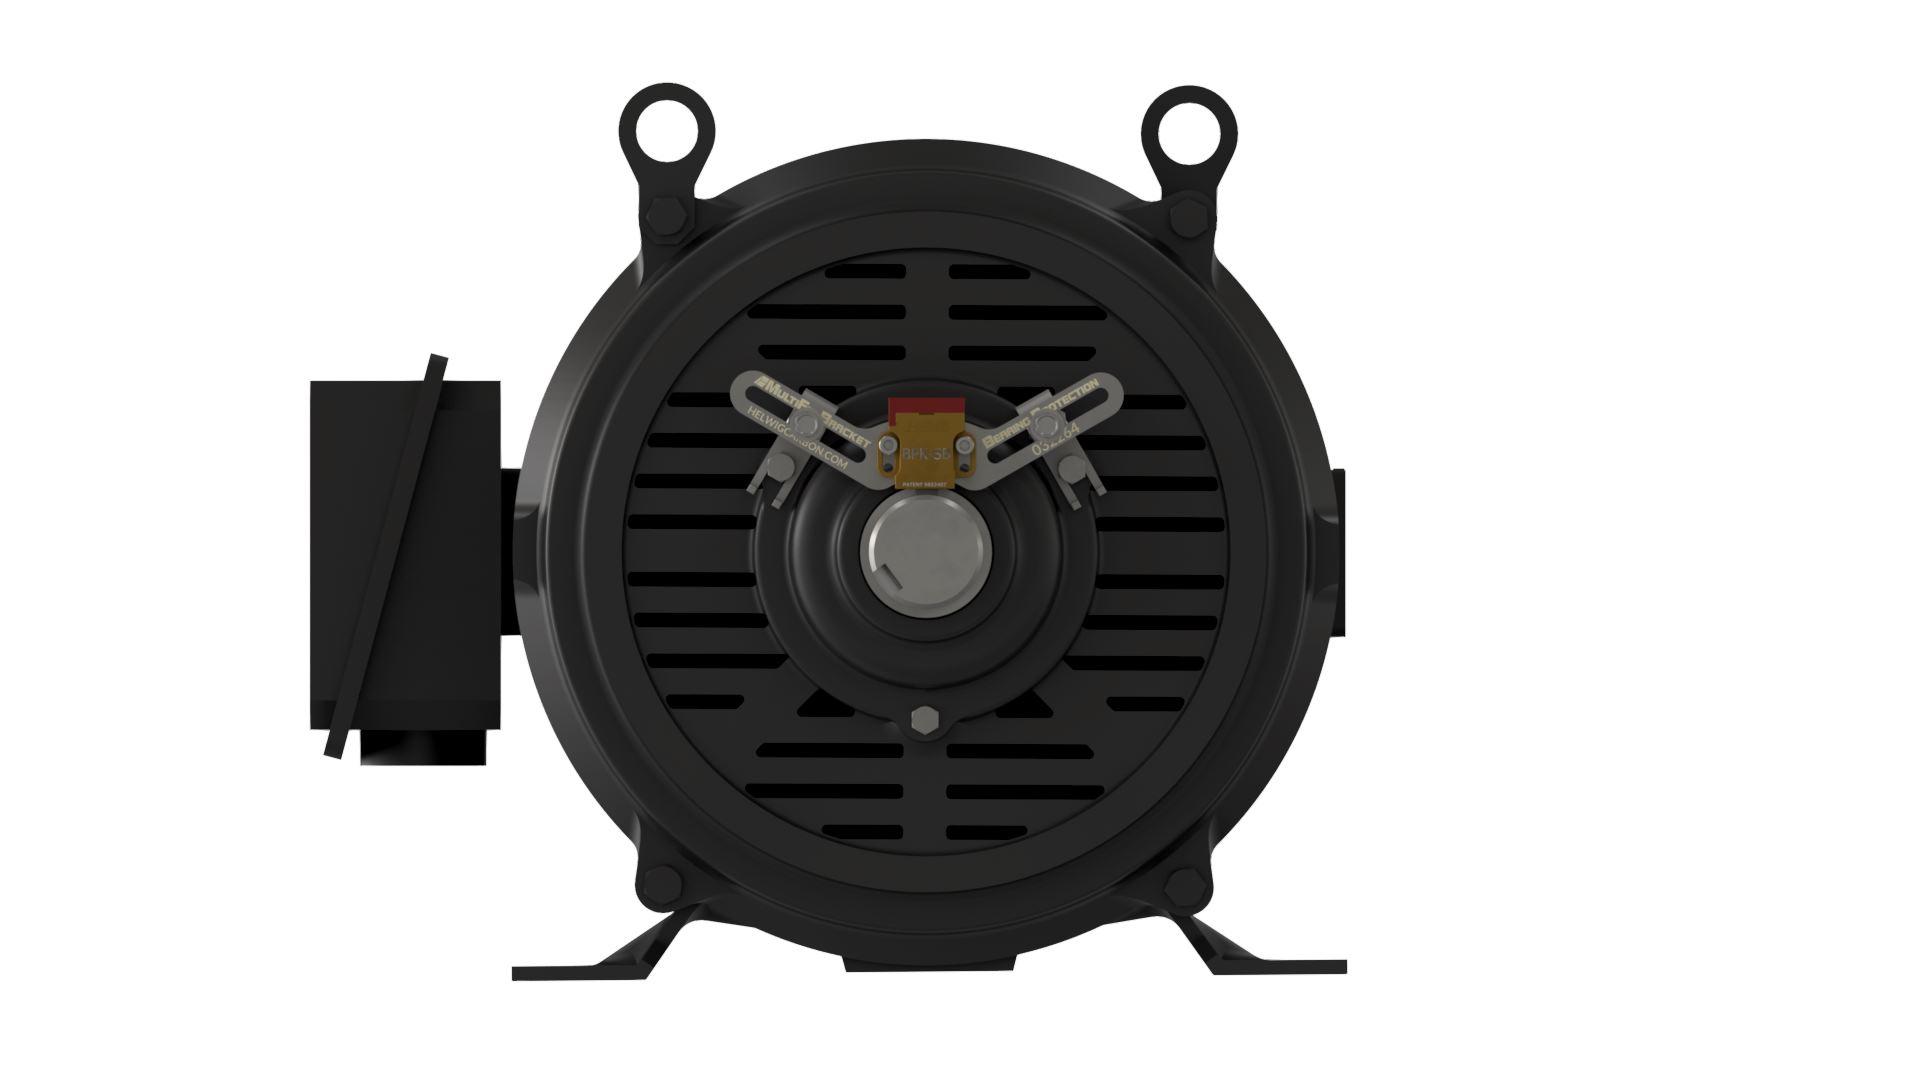 multifit bracket example 3 bolt